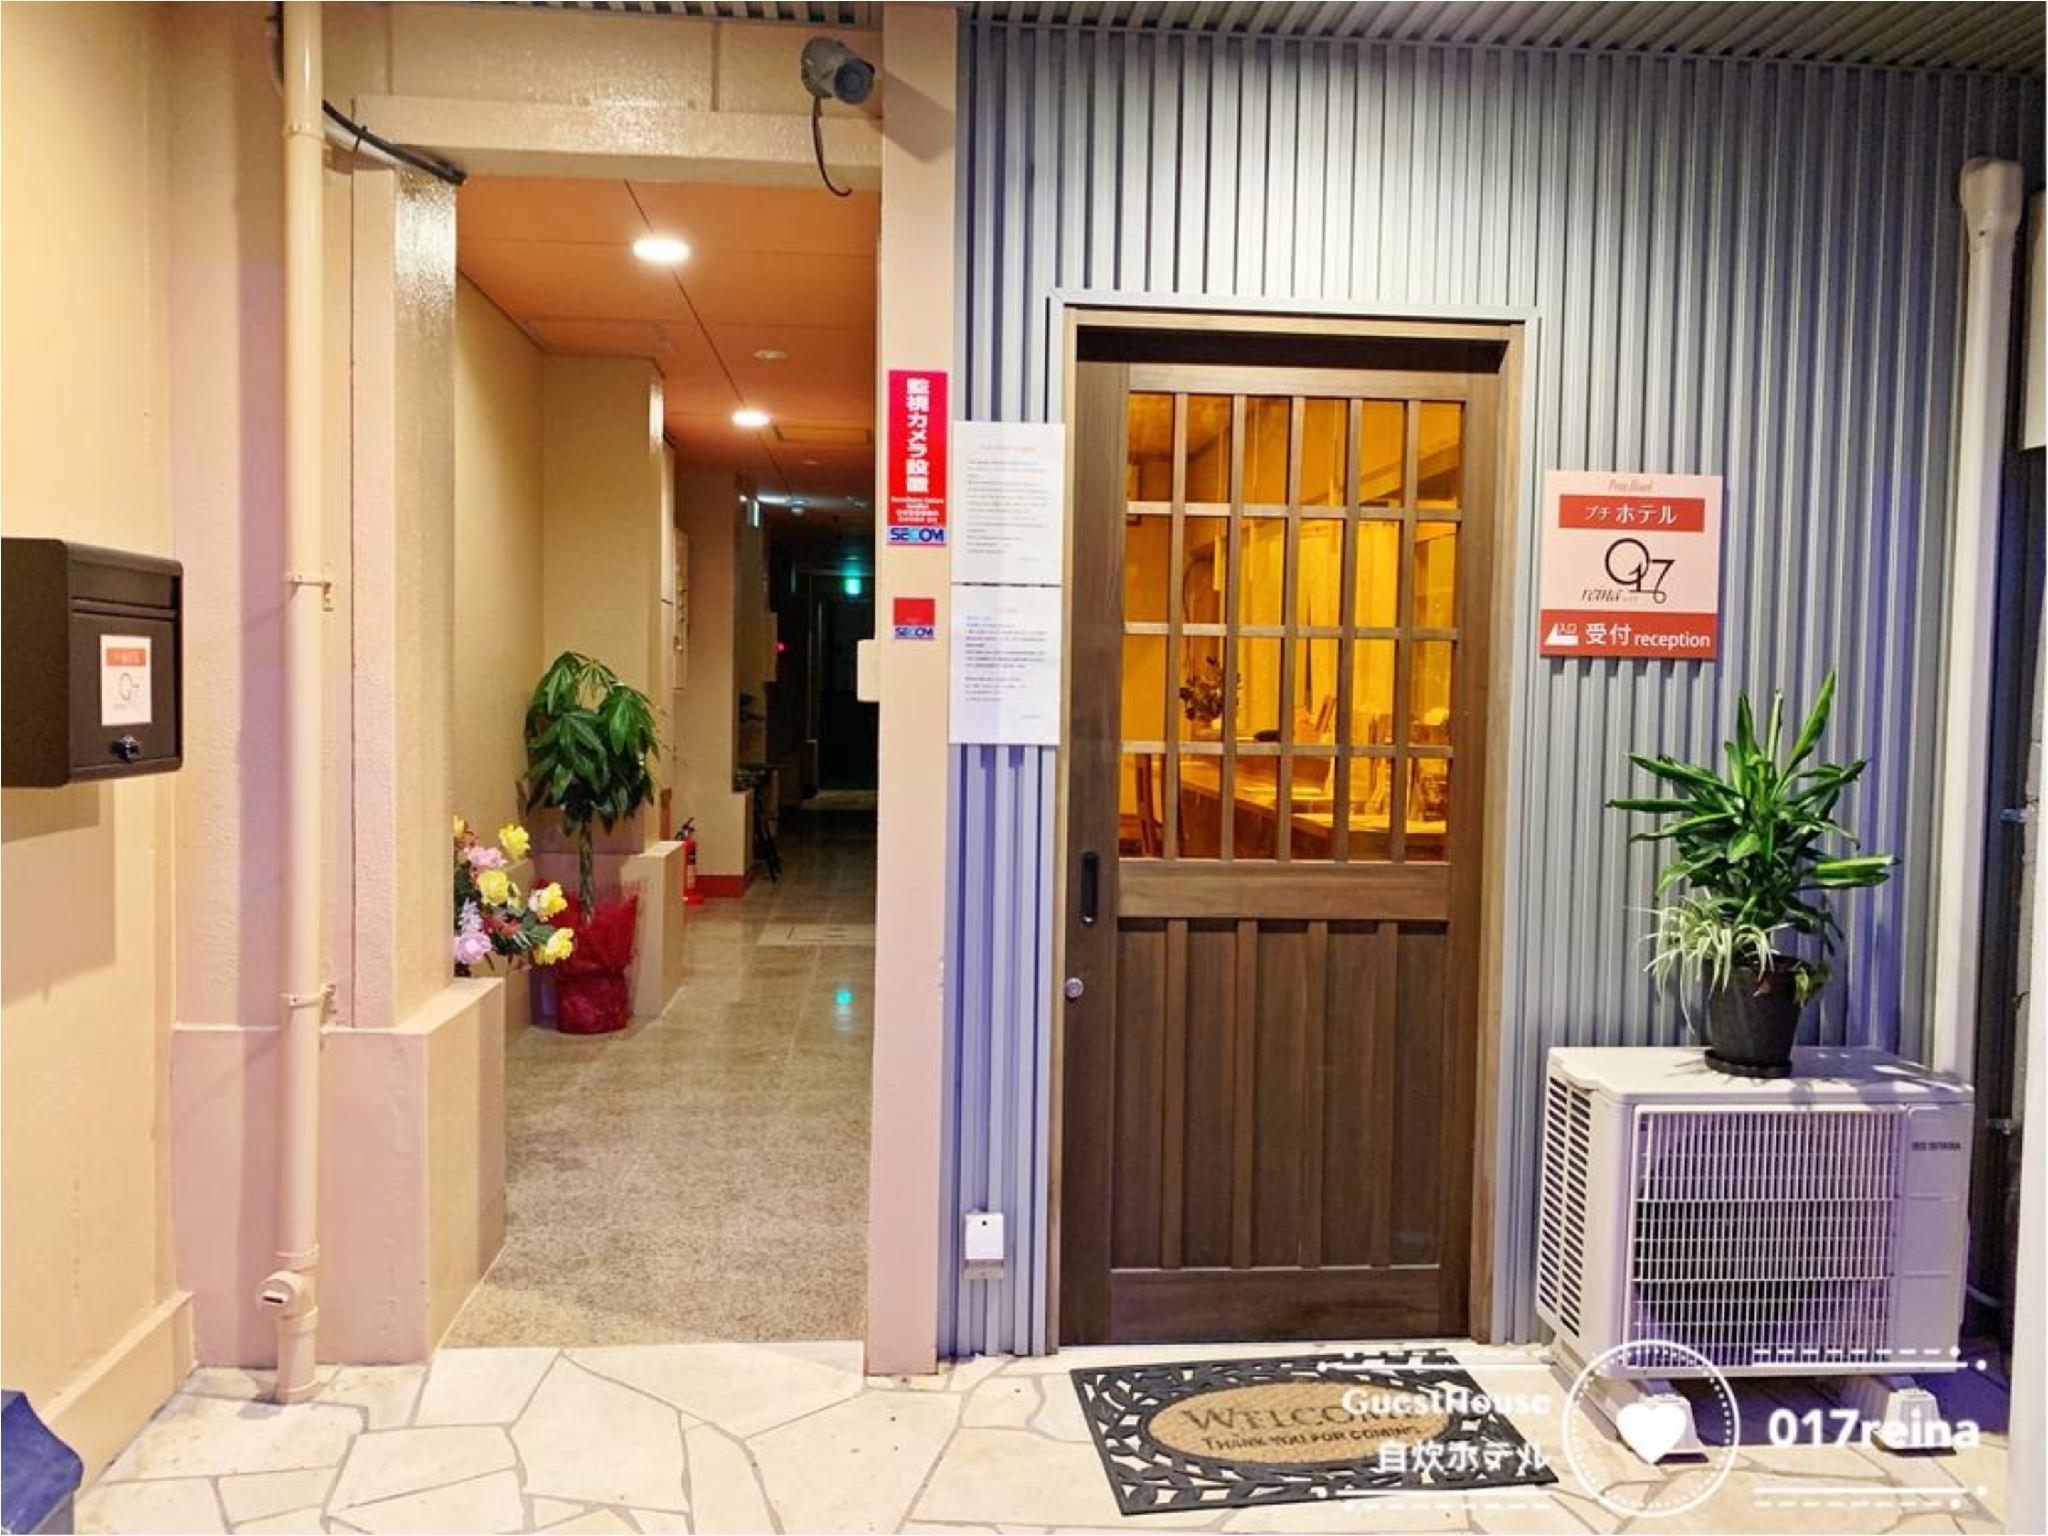 Guest House 017 Reina